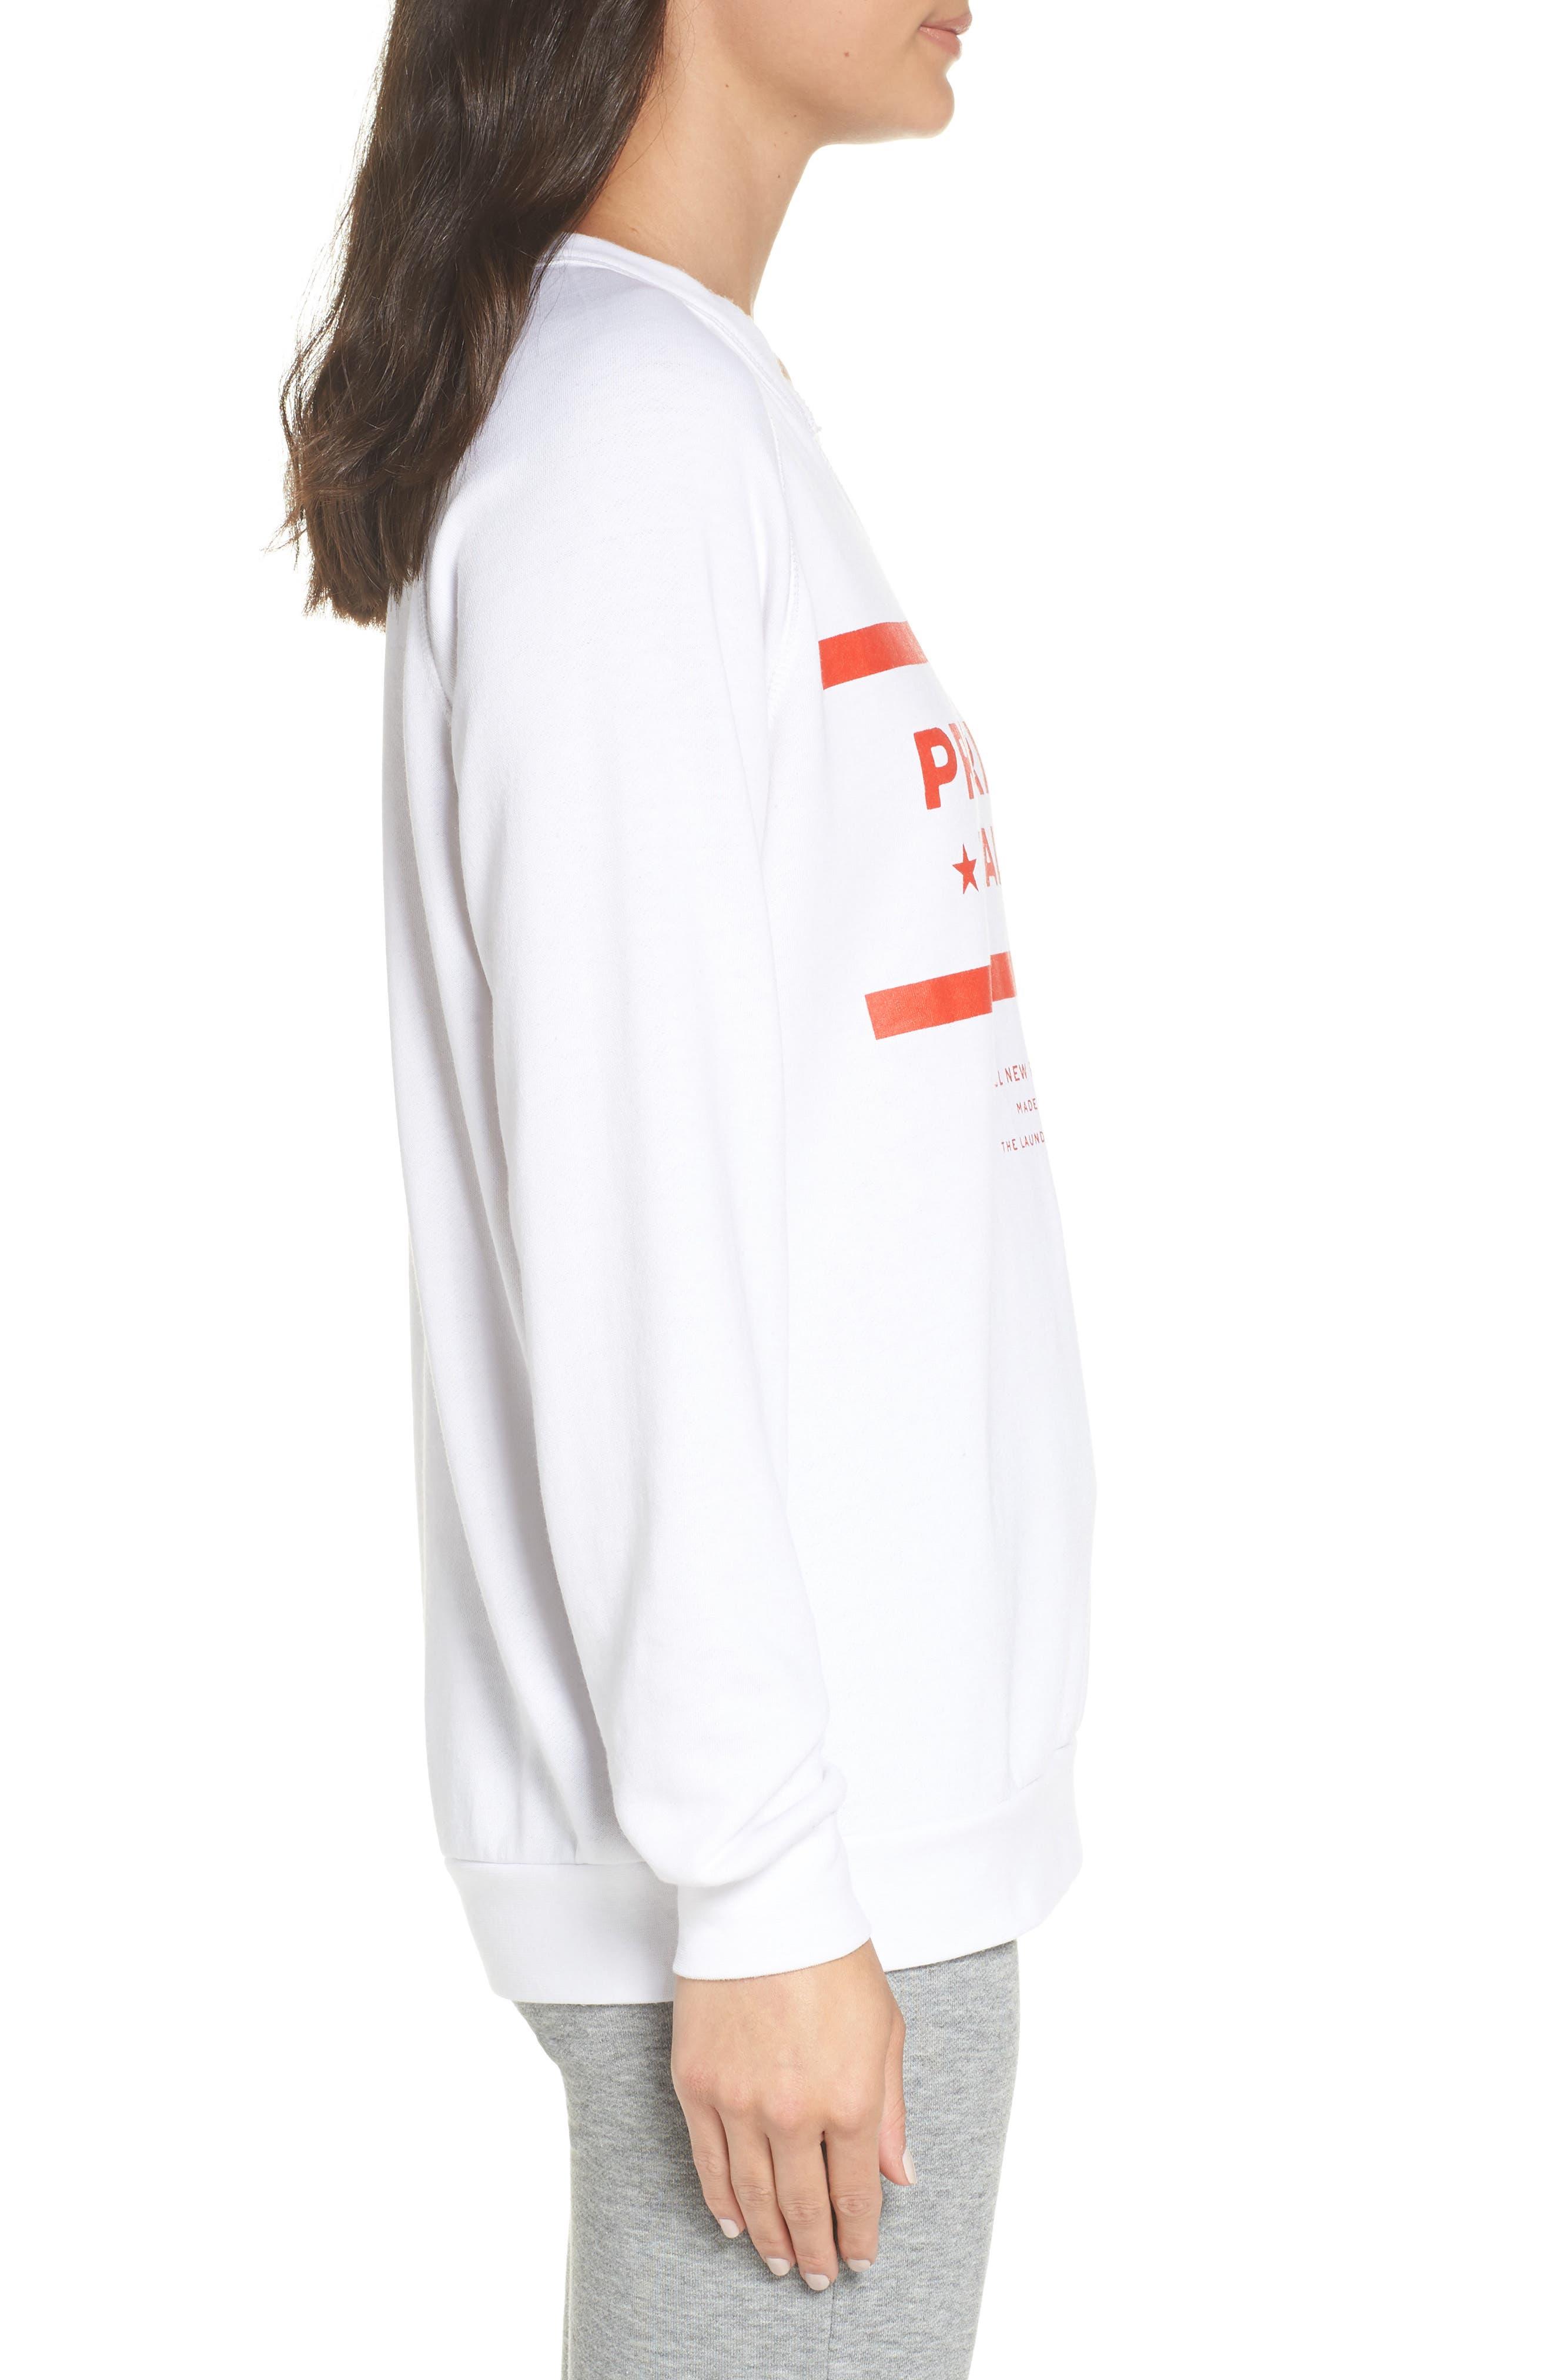 Priority Female Sweatshirt,                             Alternate thumbnail 3, color,                             WHITE